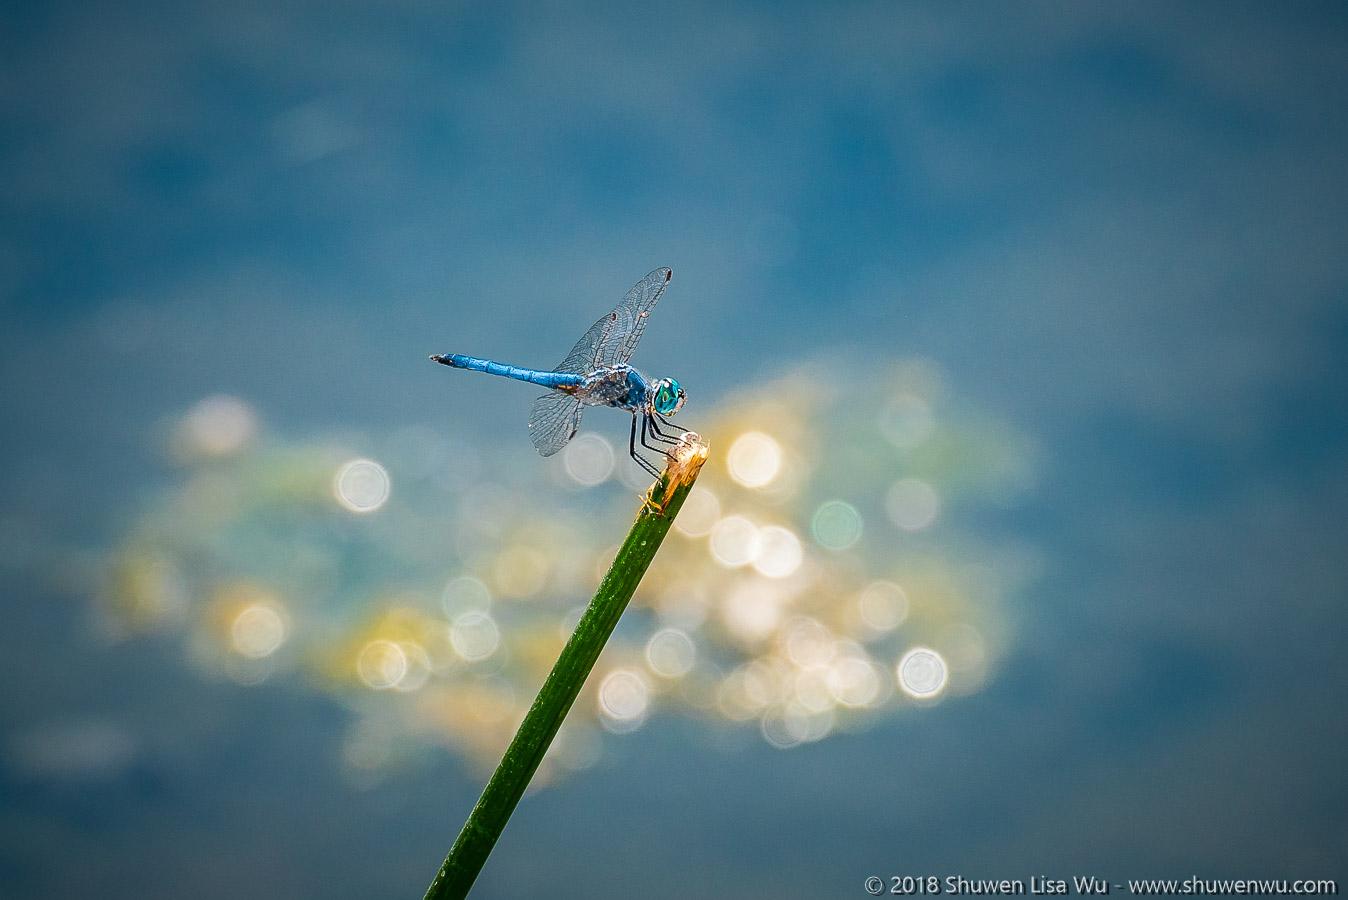 Pachydiplax longipennis (Blue Dasher) at Santee Lakes, San Diego County, California.